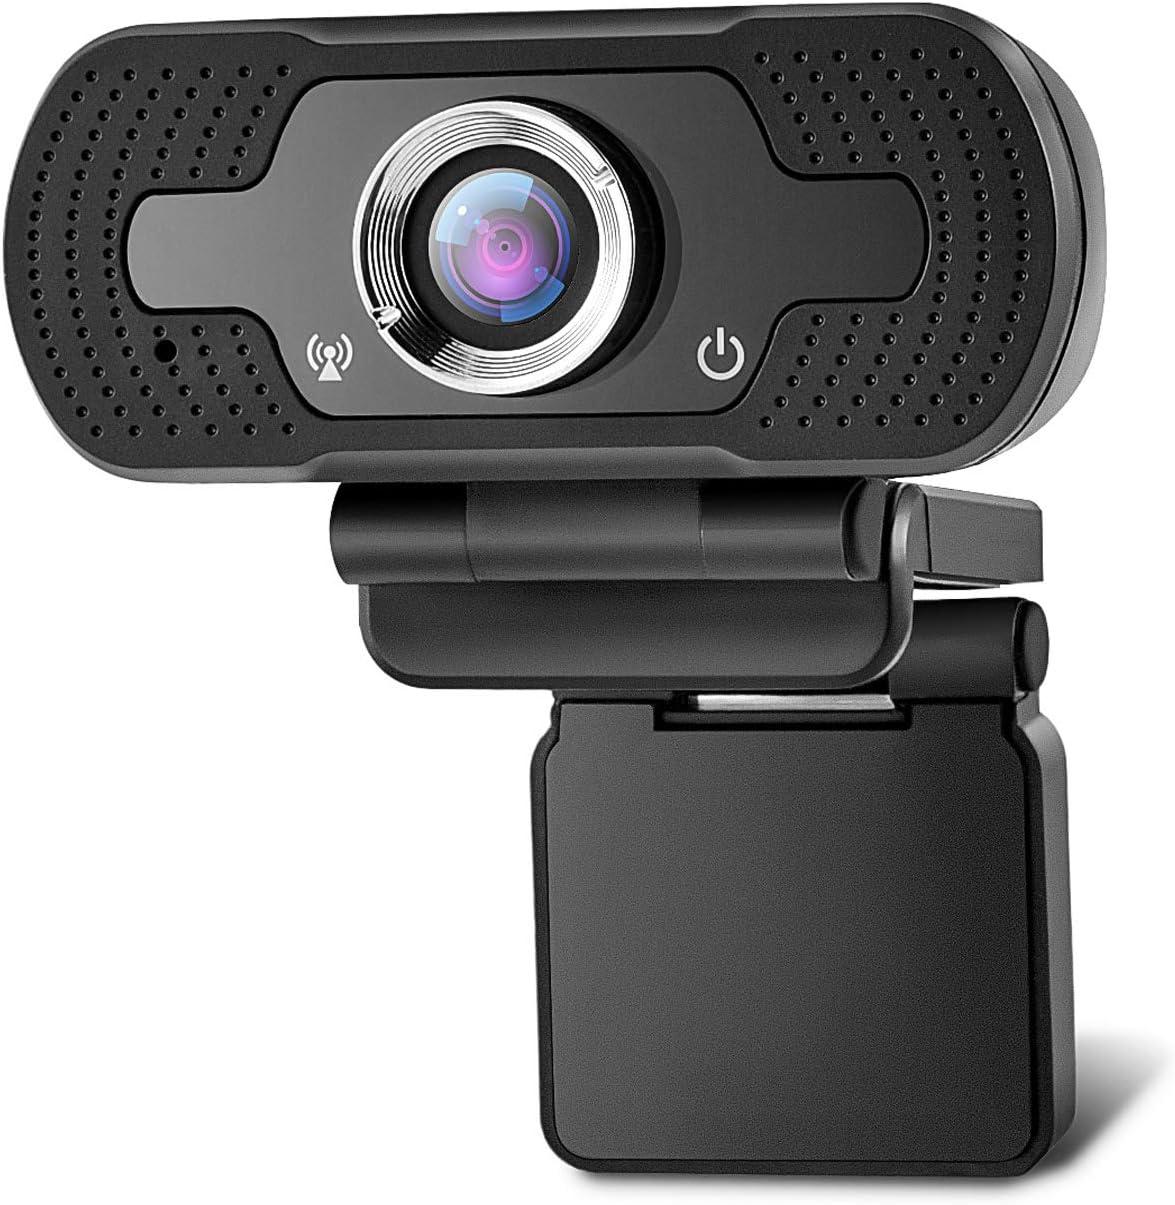 1080p Webcam with Microphone, Noise Reduction HD USB Web Camera for Zoom Meeting YouTube Skype FaceTime Hangouts, PC Mac Laptop Desktop